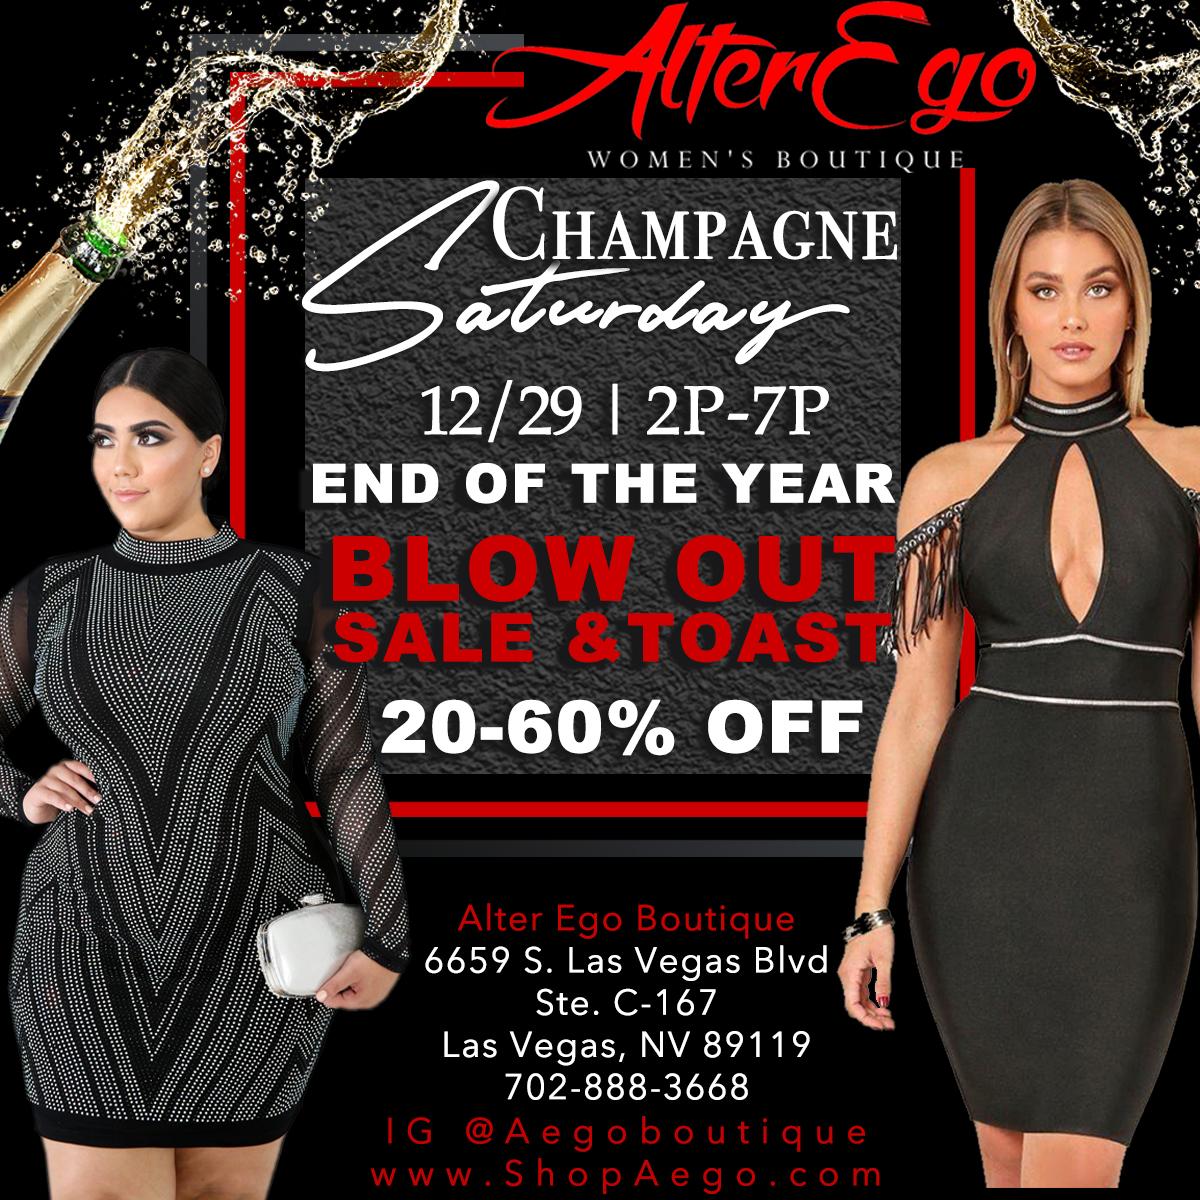 ChampagneSaturday